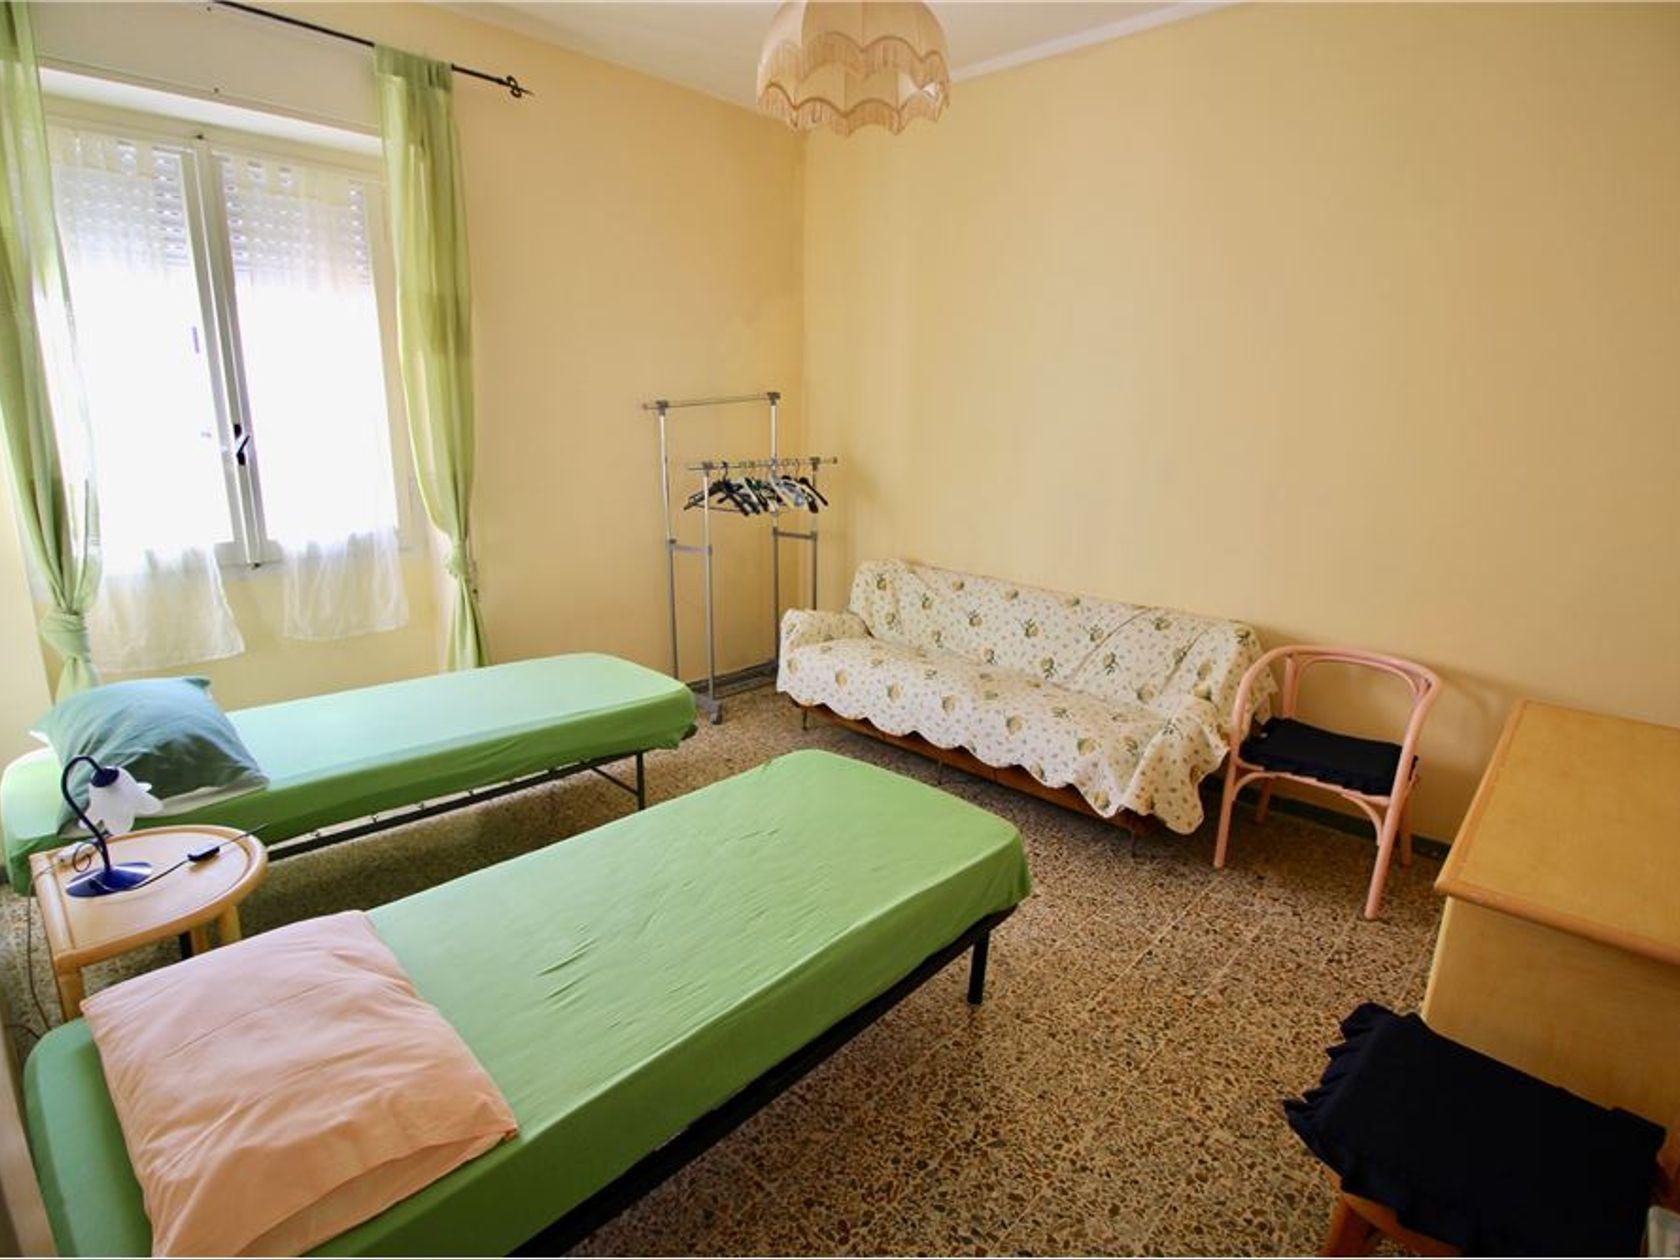 Appartamento Ss-centro, Sassari, SS Vendita - Foto 11